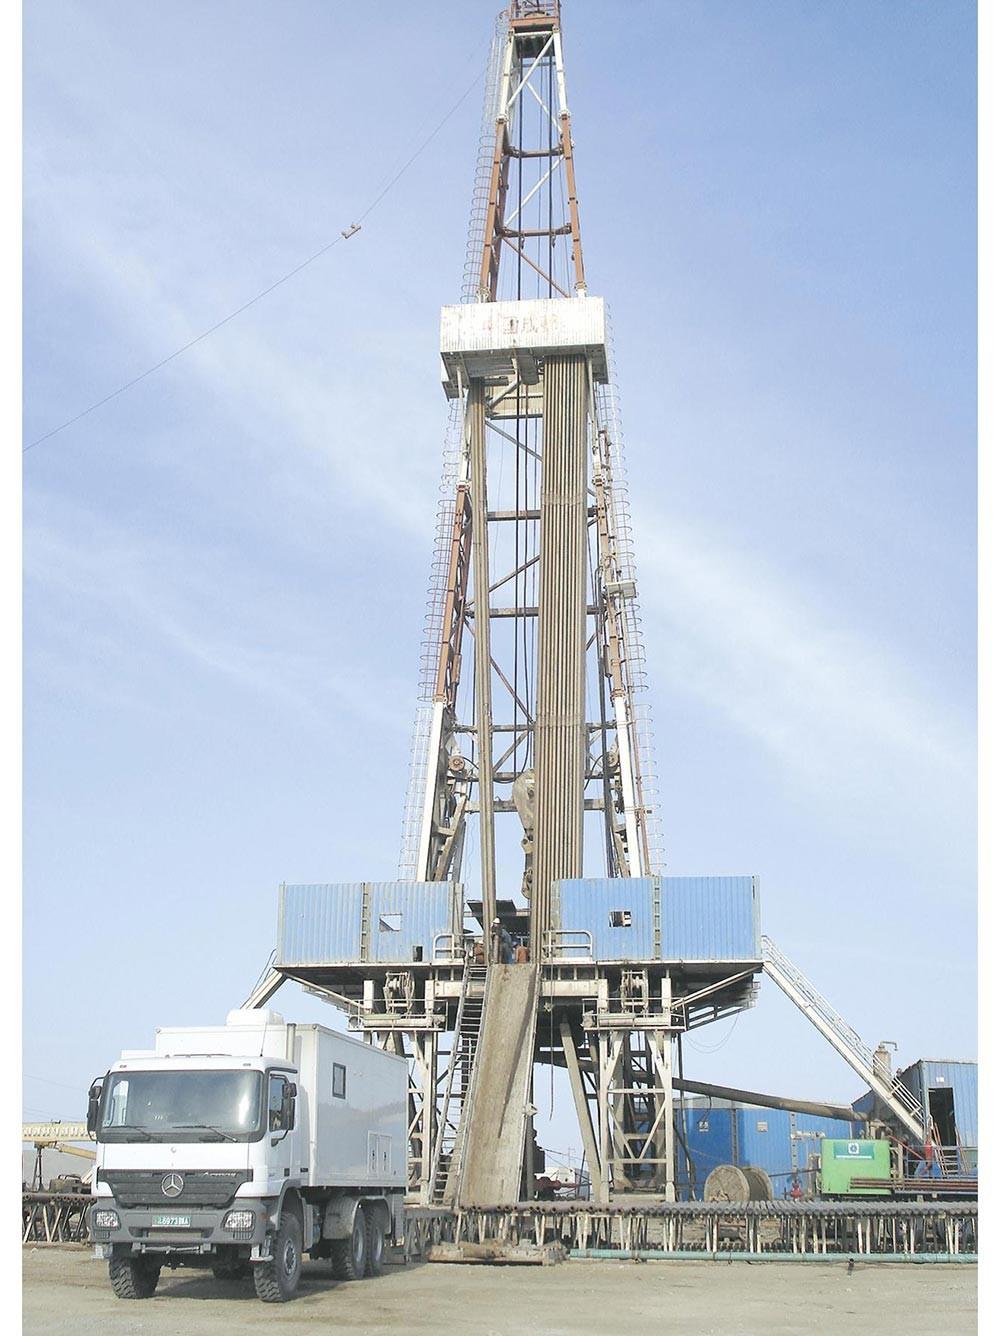 https://oilgas.gov.tm/storage/posts/2835/original-161248e16bcf6f.jpeg